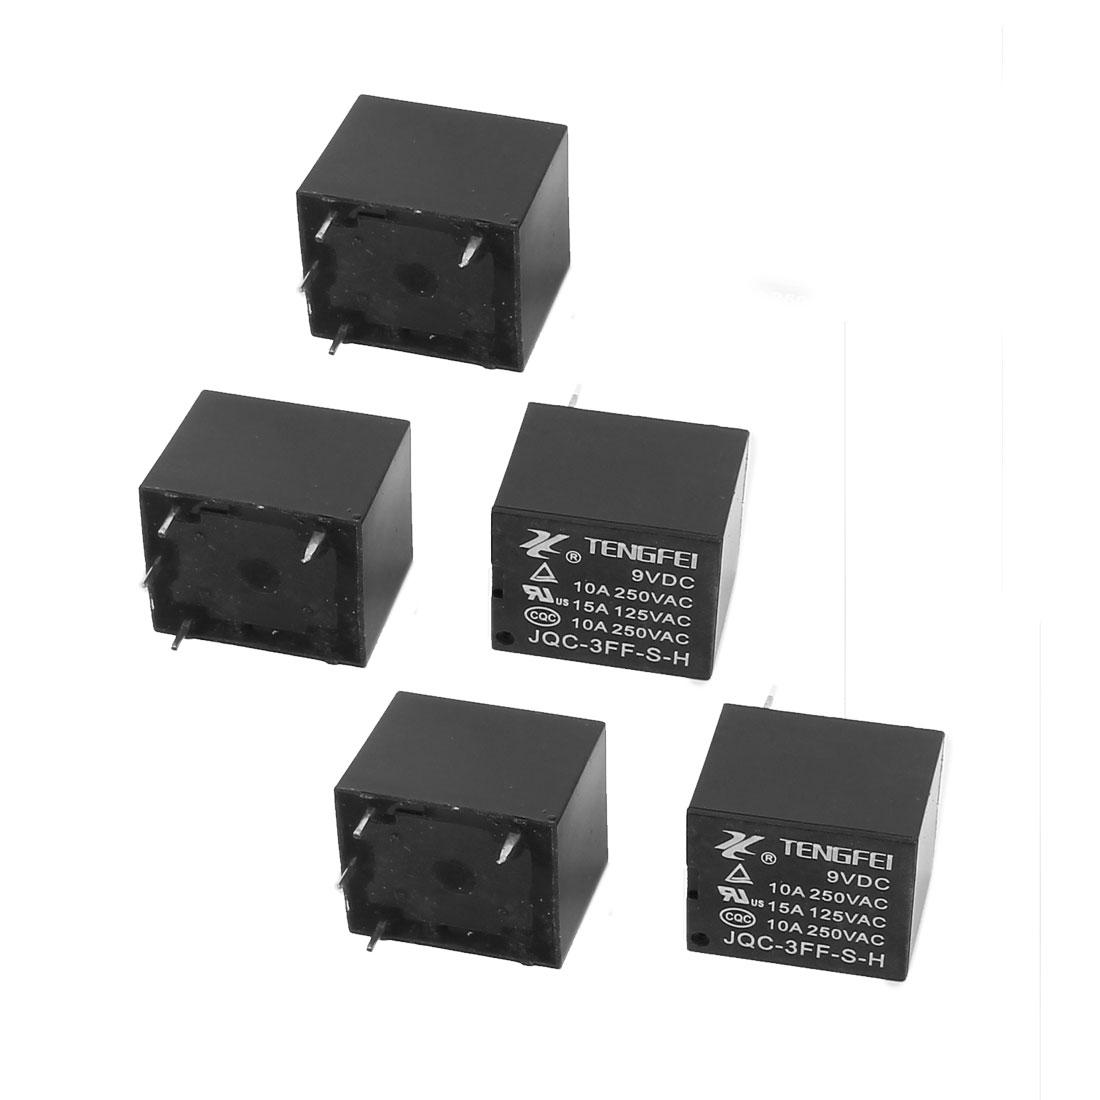 10Pcs DC9V 10A 0.36W 4 Terminal SPST NO Mini Power Coil Electromagnetic Relay